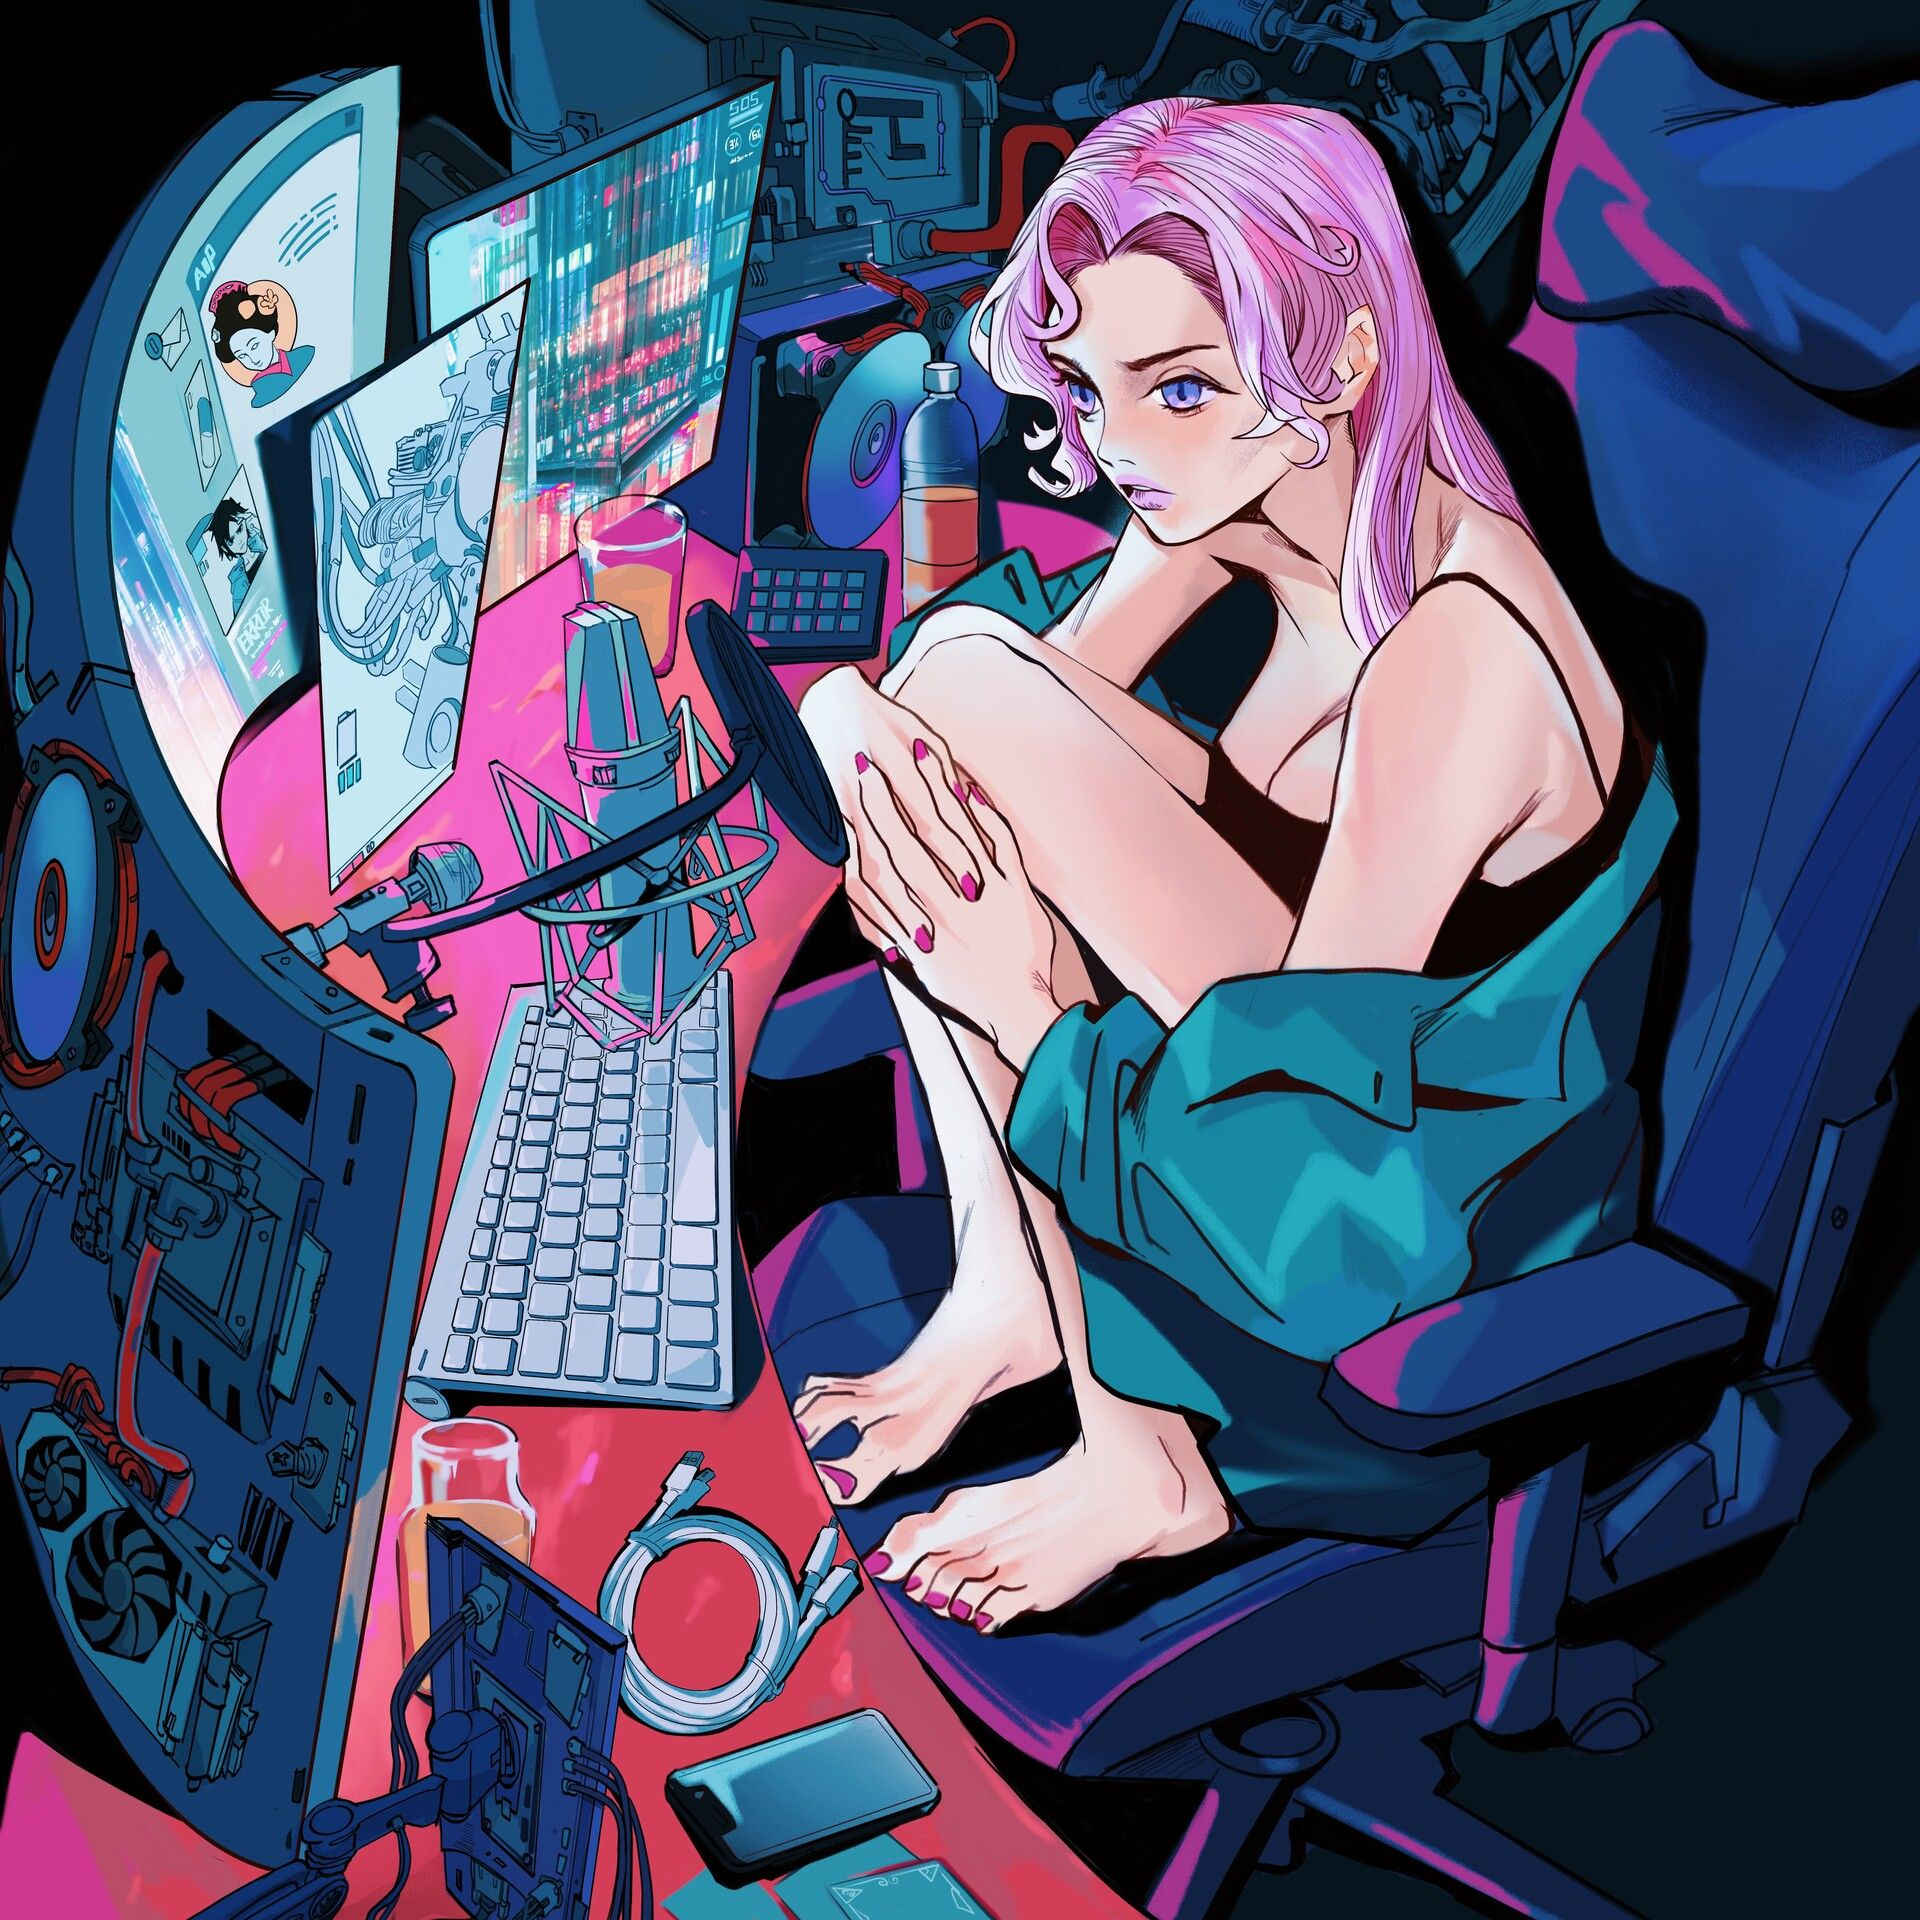 Otaku Girl By Yichun Hu Character Design Cyberpunk Art Cyberpunk Aesthetic